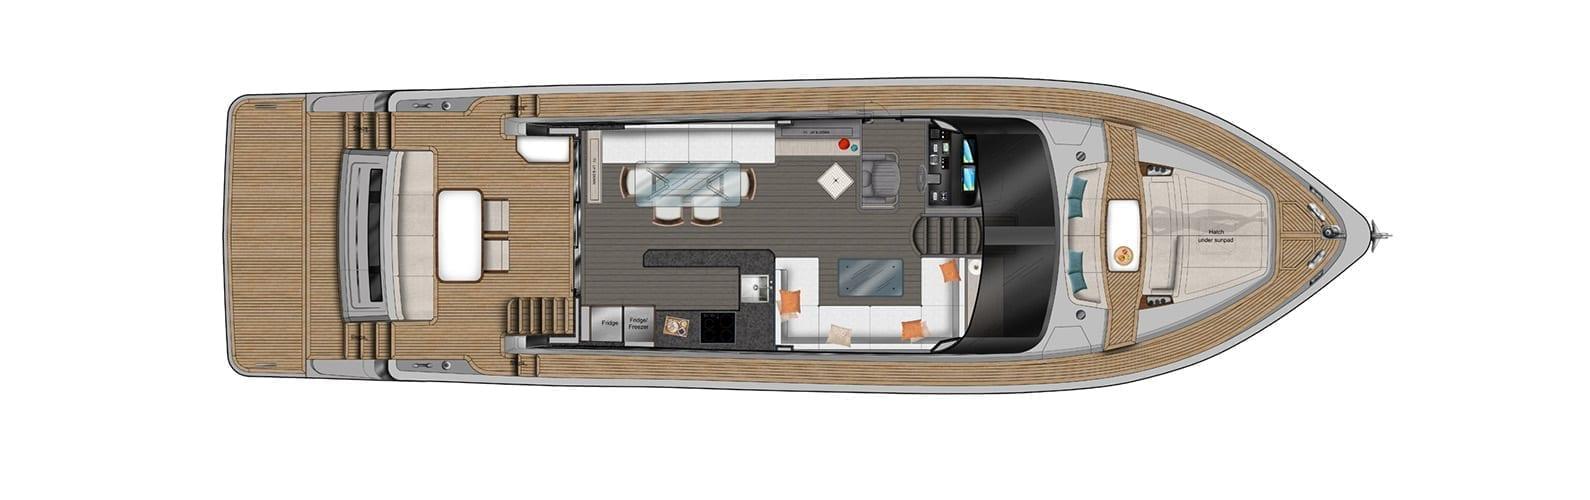 Uniesse-Capri-6-footprint2